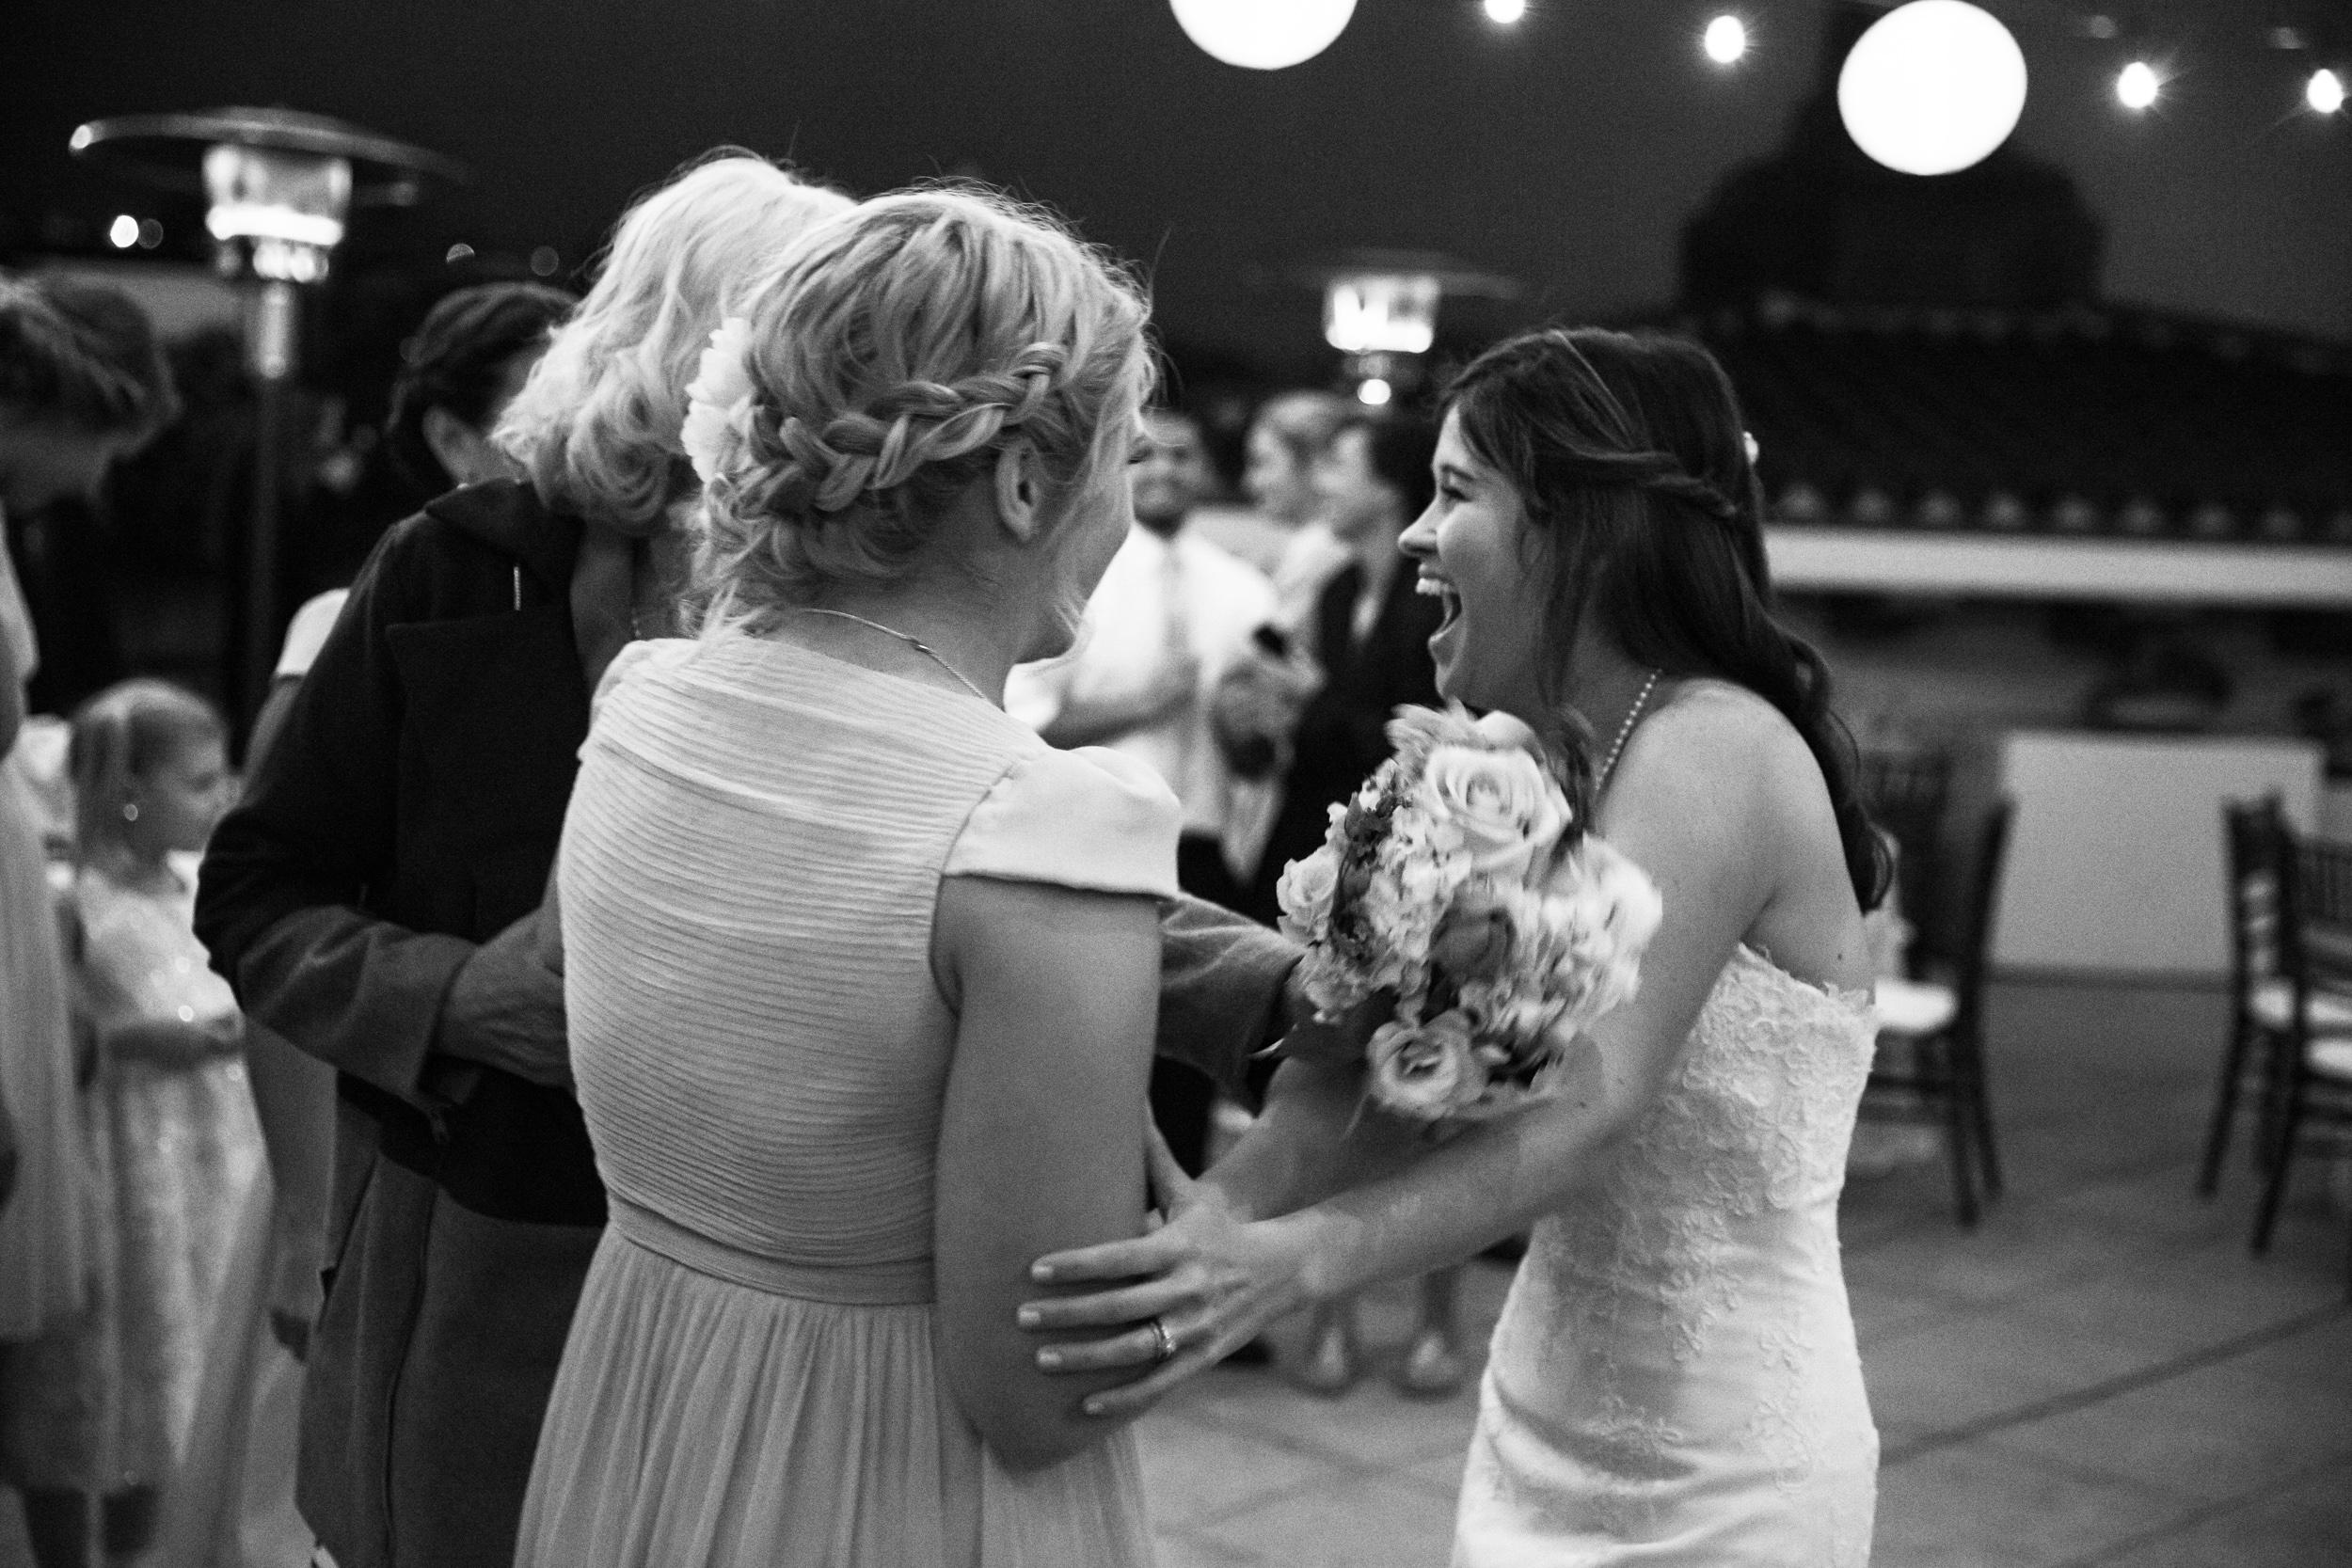 33--jewel-maree-photography-wedding.jpg